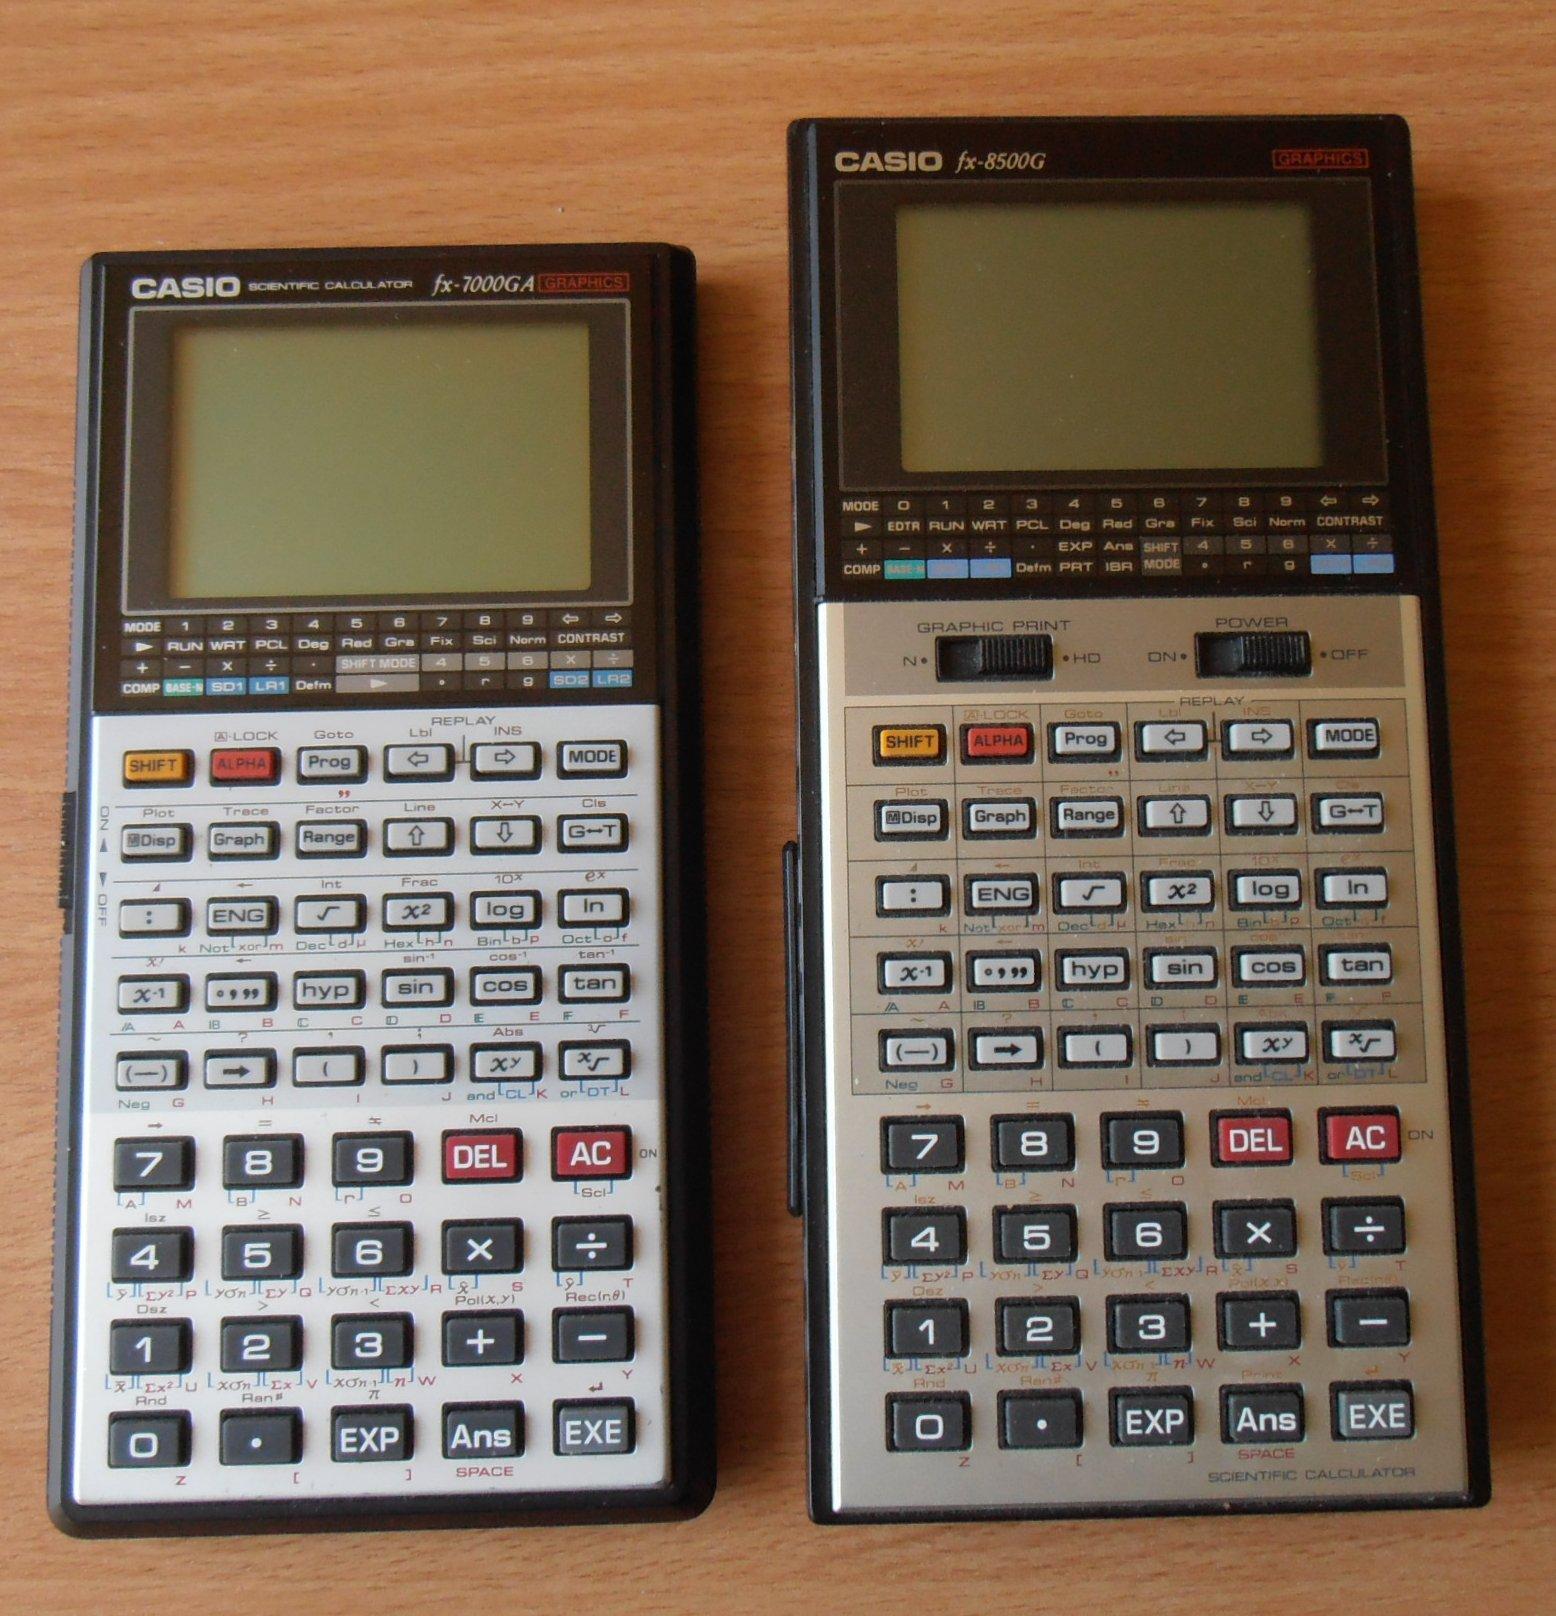 Casio FX-7000 GA et FX-8500 G